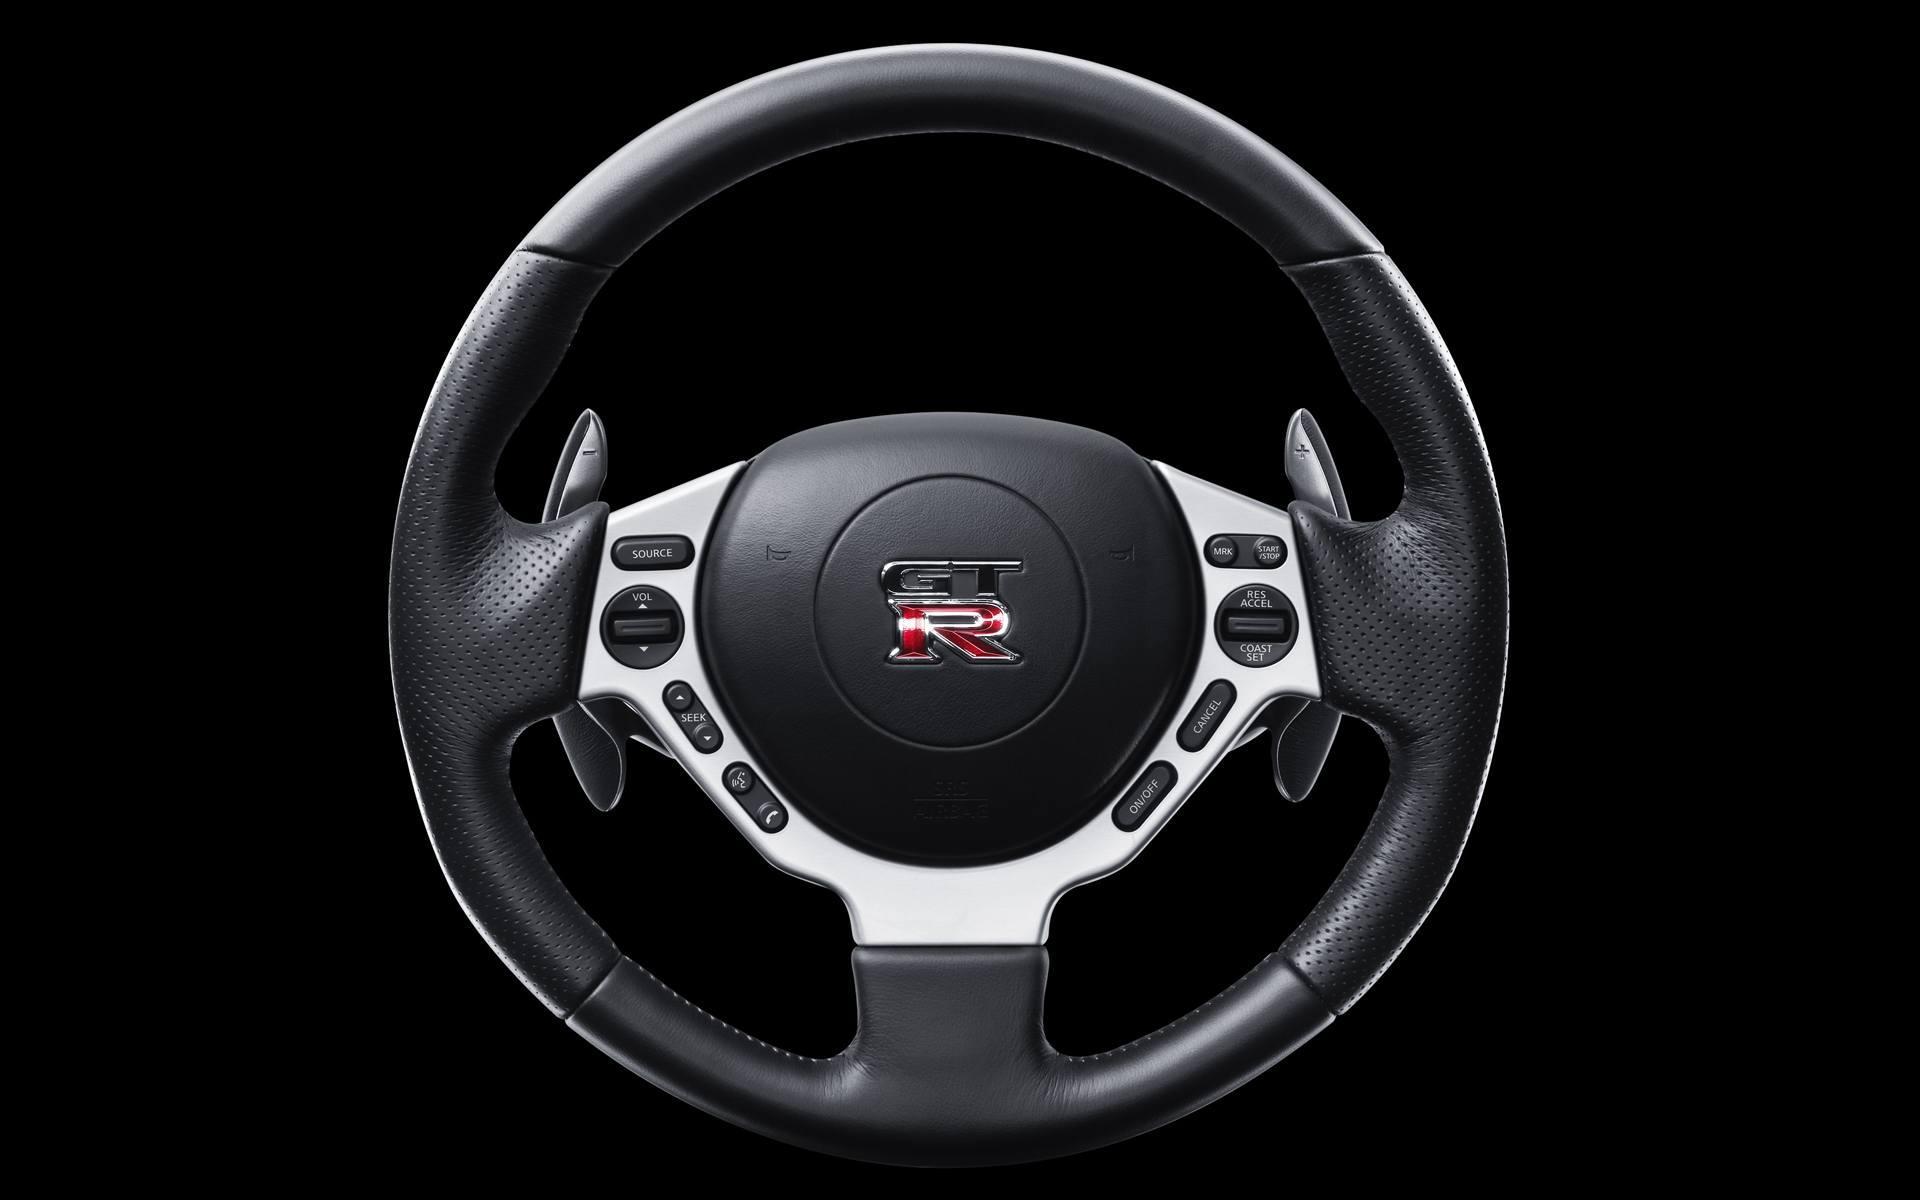 nissan gtr steering wheel wallpaper 50215